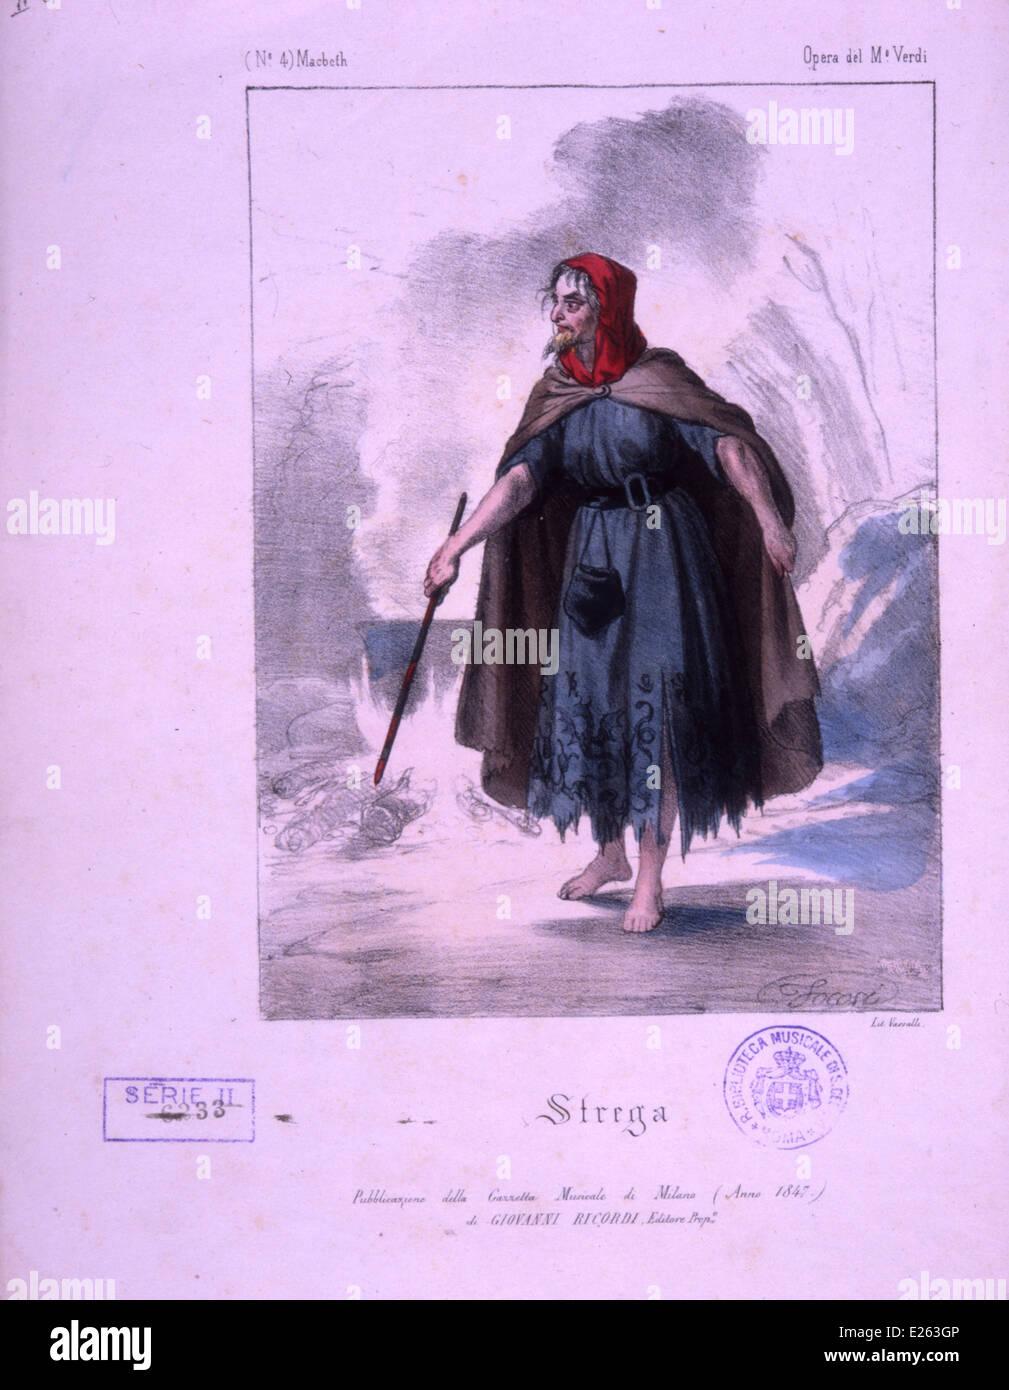 giuseppe verdi,macbeth,the witch,lithograph,1800 - Stock Image